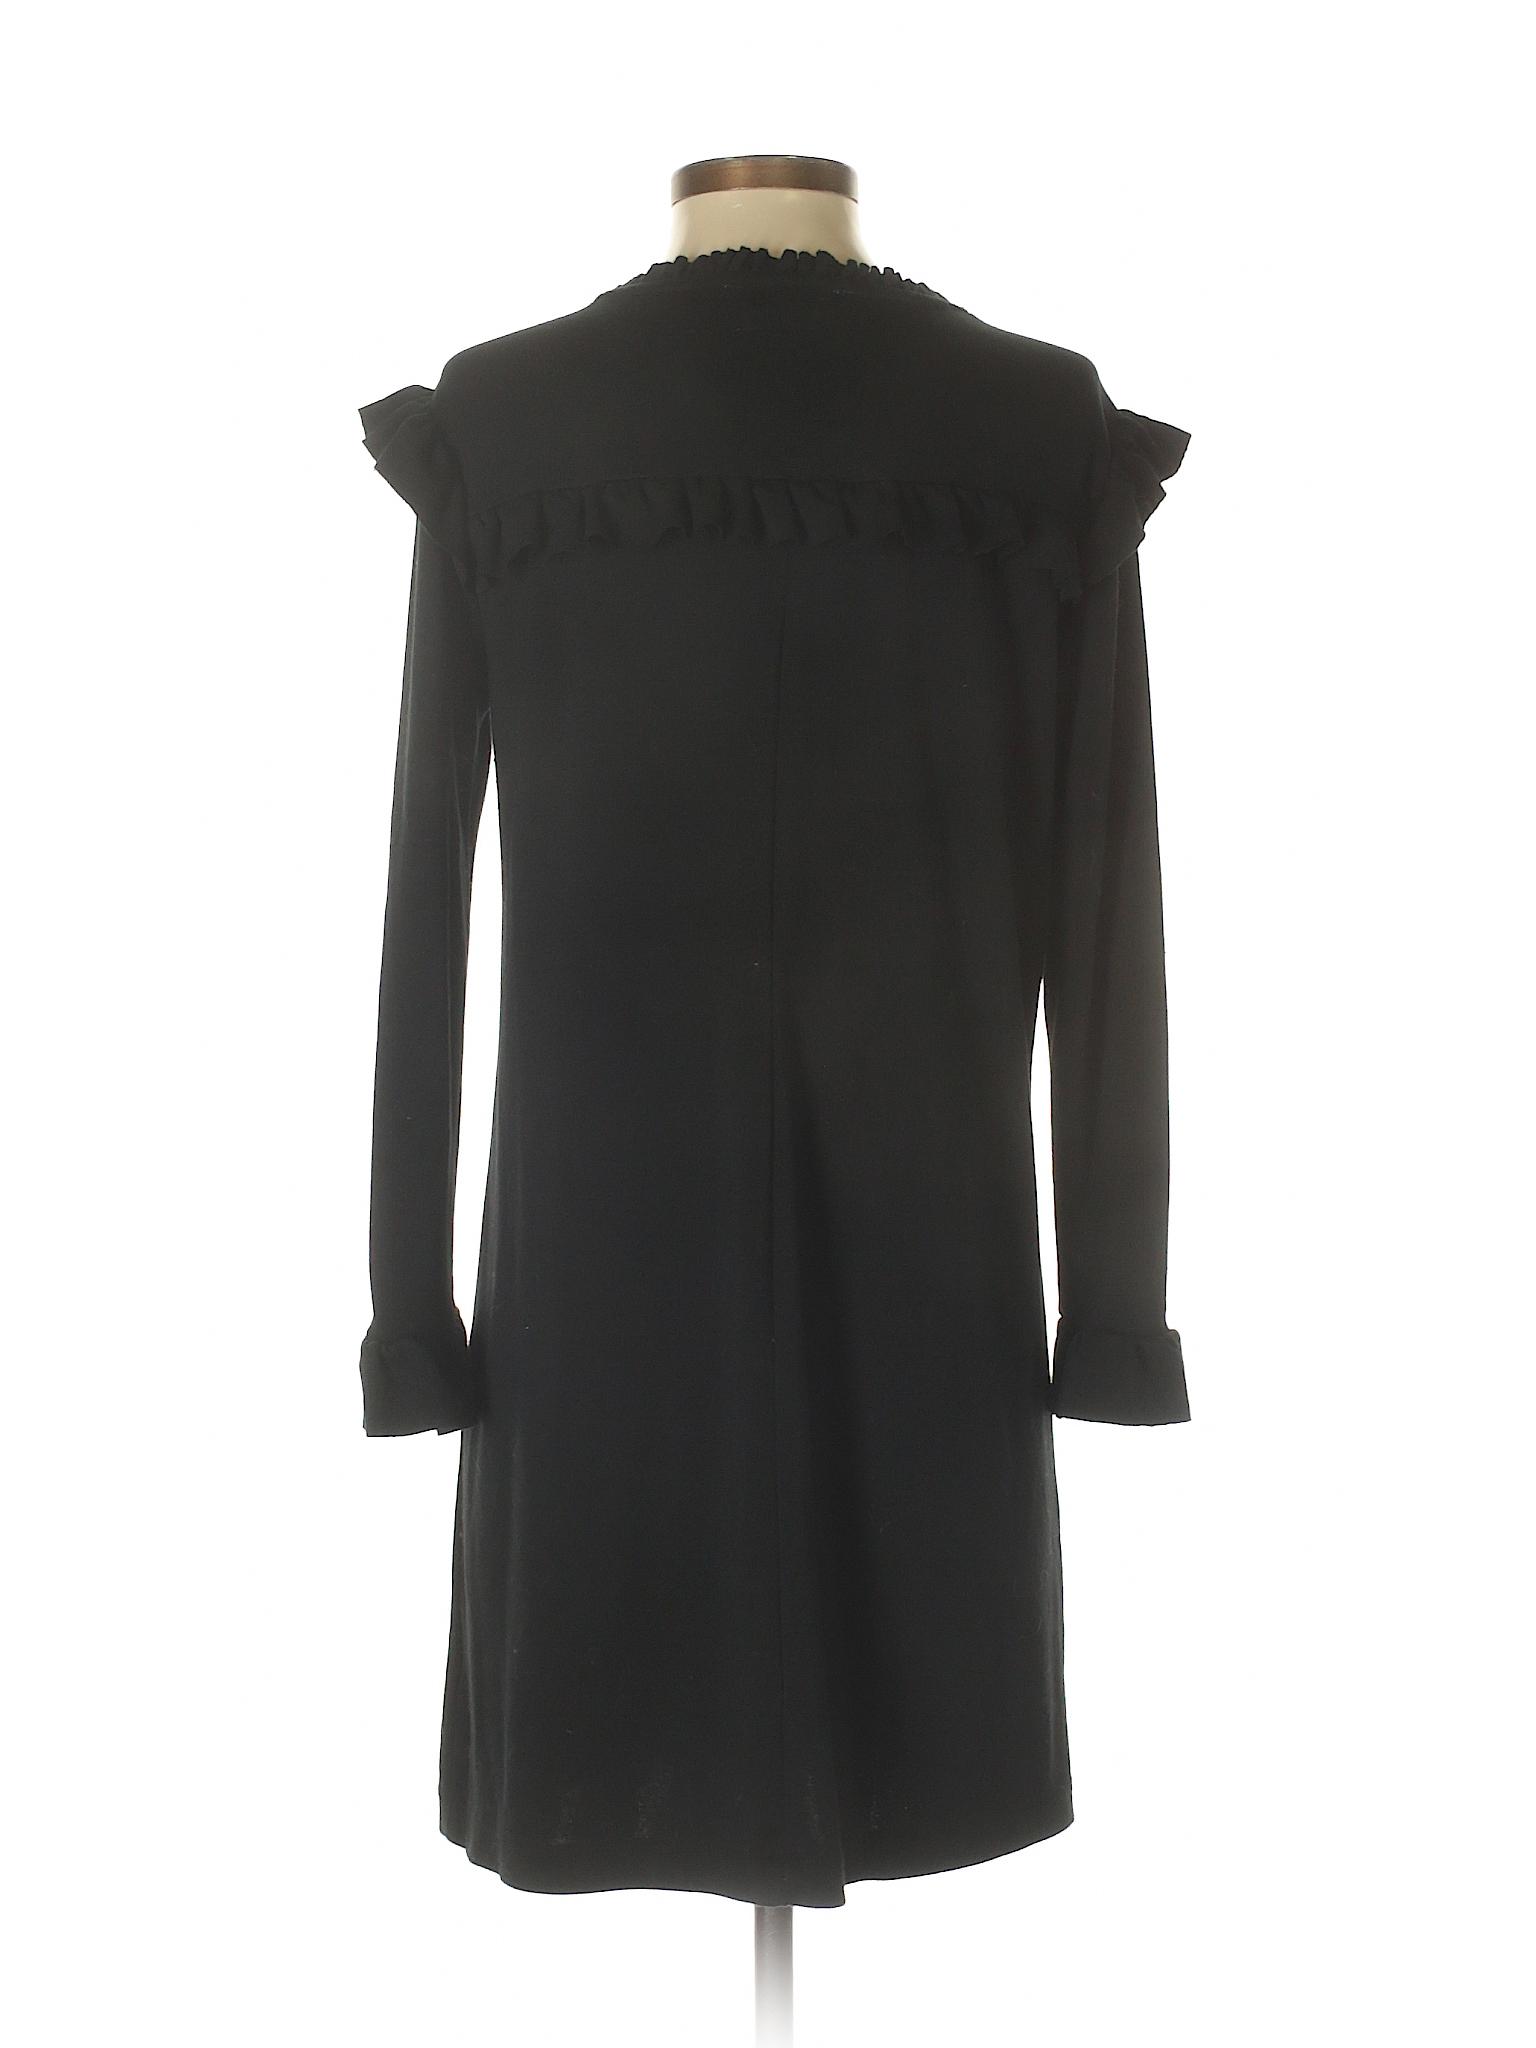 Clothing Republic Dress Casual Philosophy winter Boutique qtw1XETU1